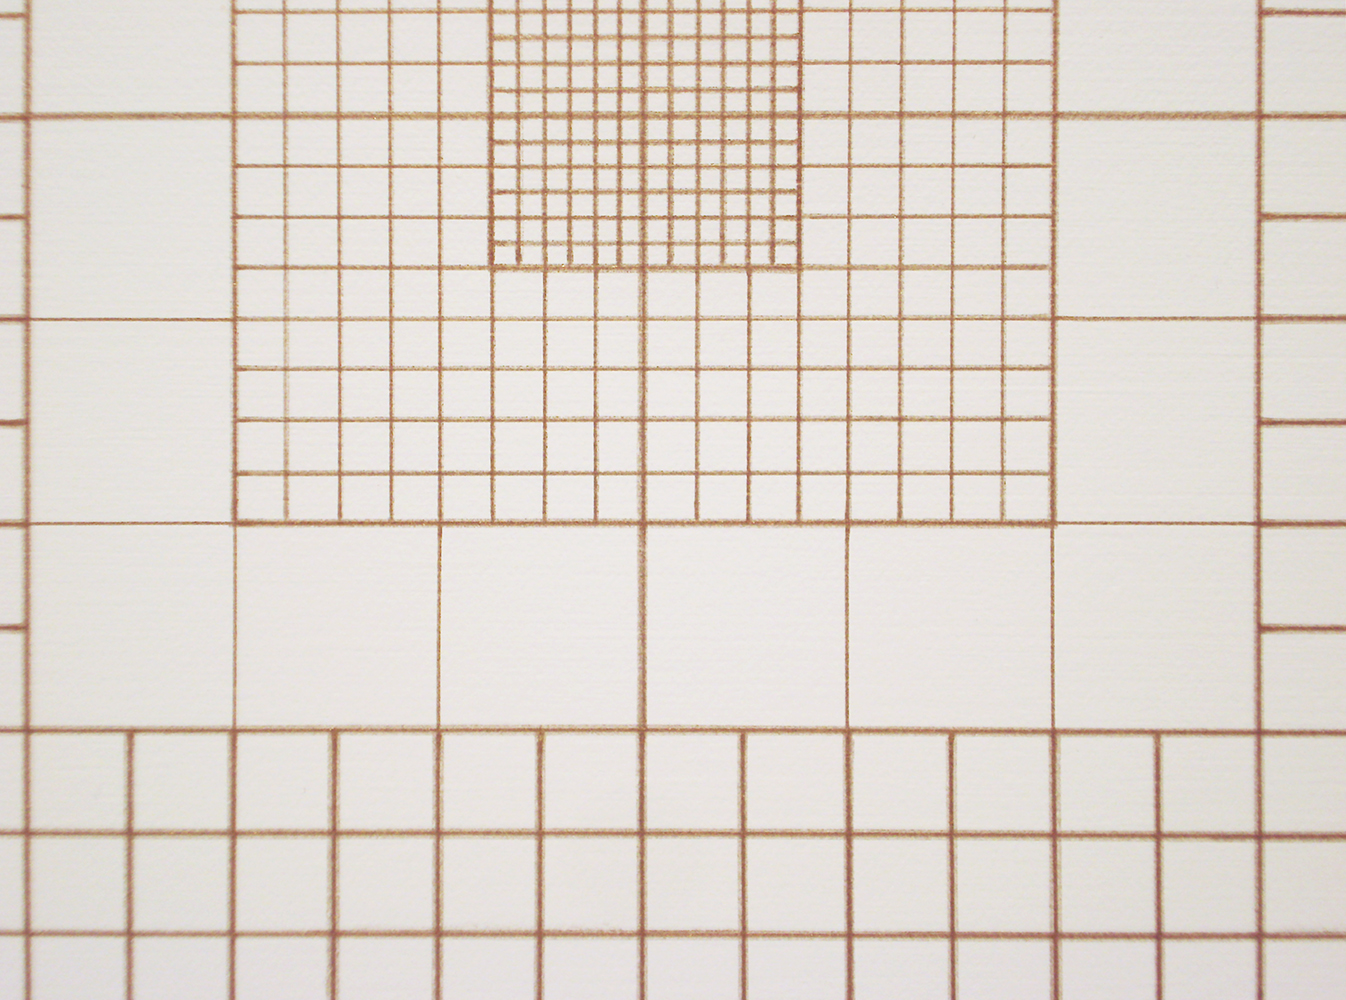 Yantra-origo-metrum [20180512]_2018_acrylic-on-canvas_29 1-2x23 5-8 in.[75x60cm]-5_kB.jpg